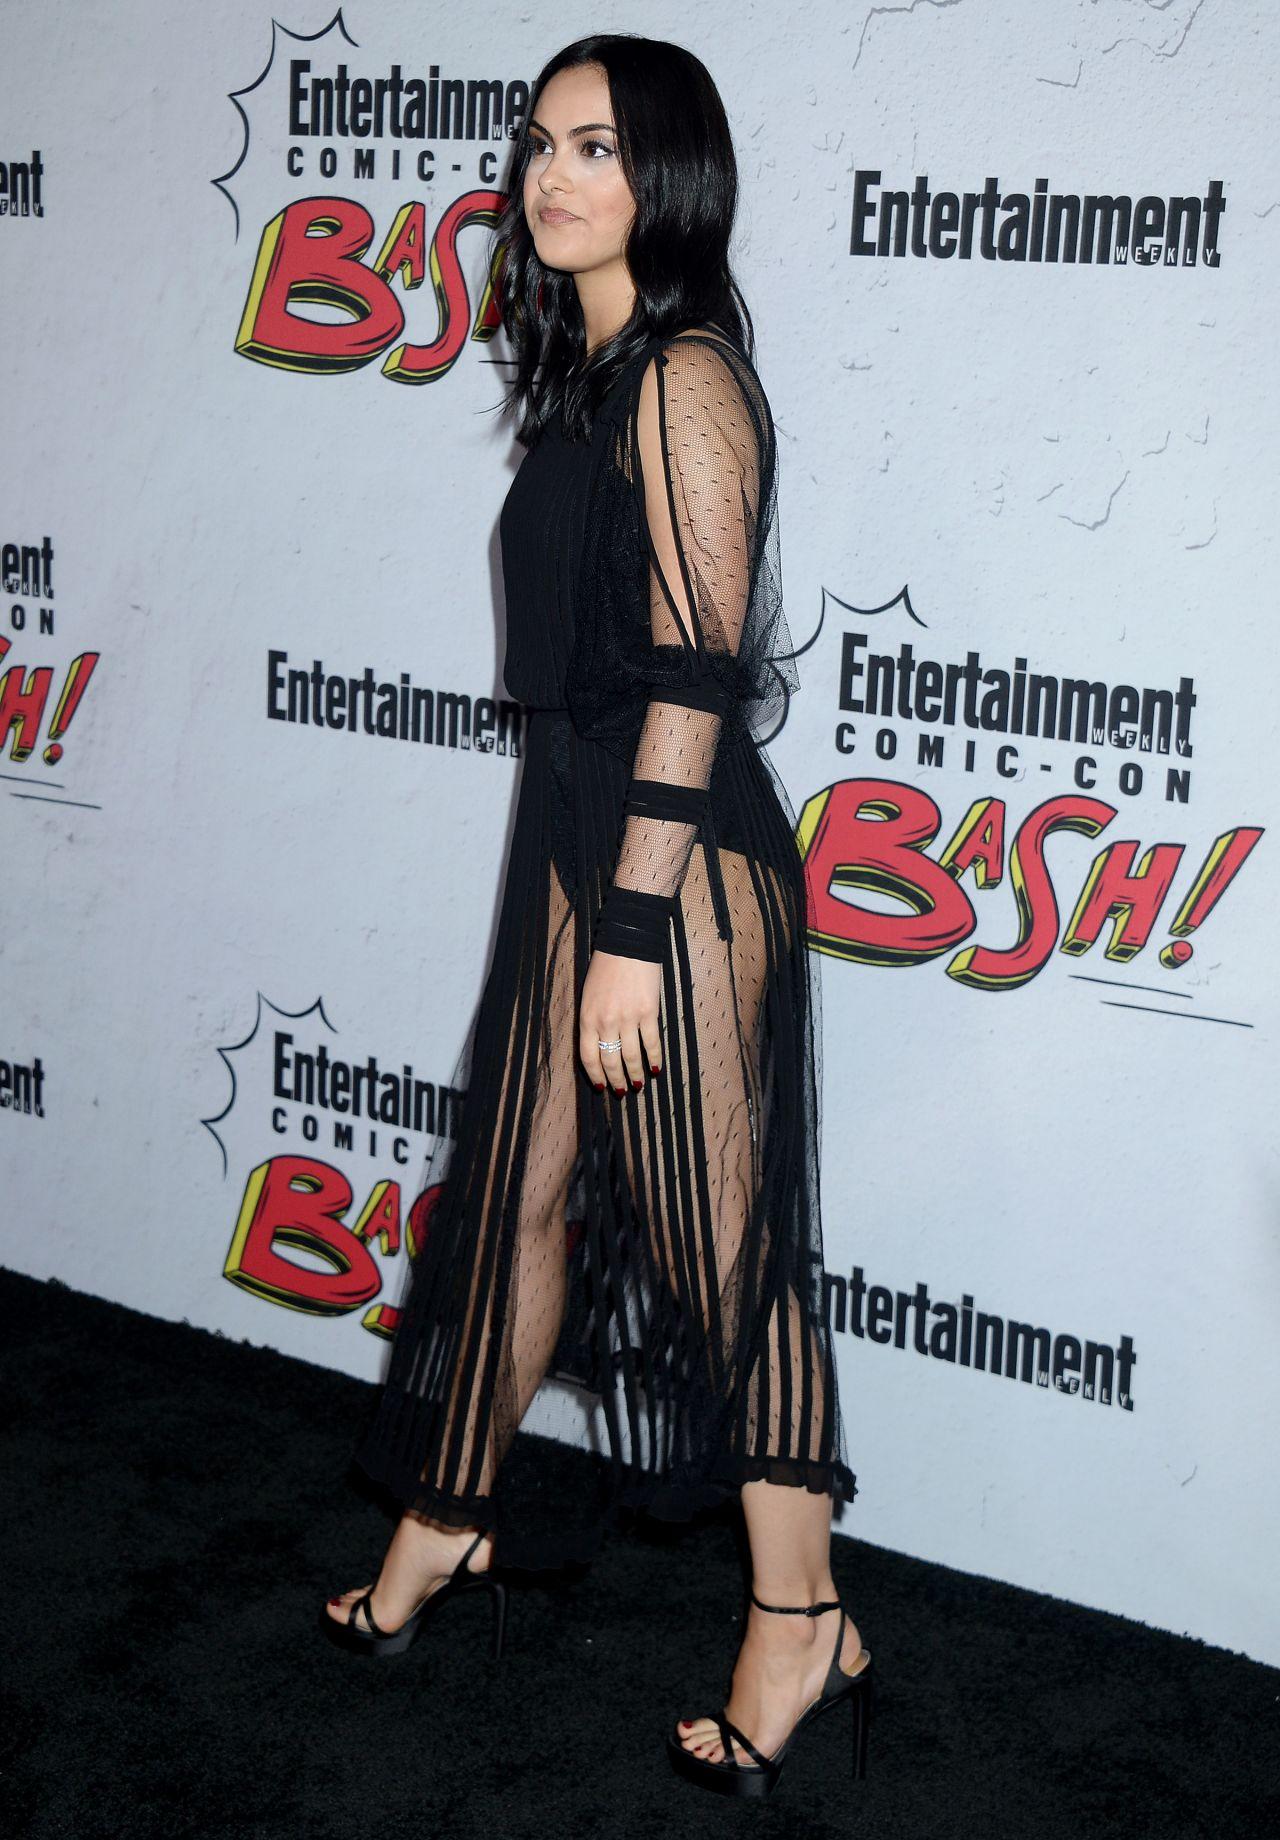 Camila Mendes Ew Party At San Diego Comic Con 07 22 2017